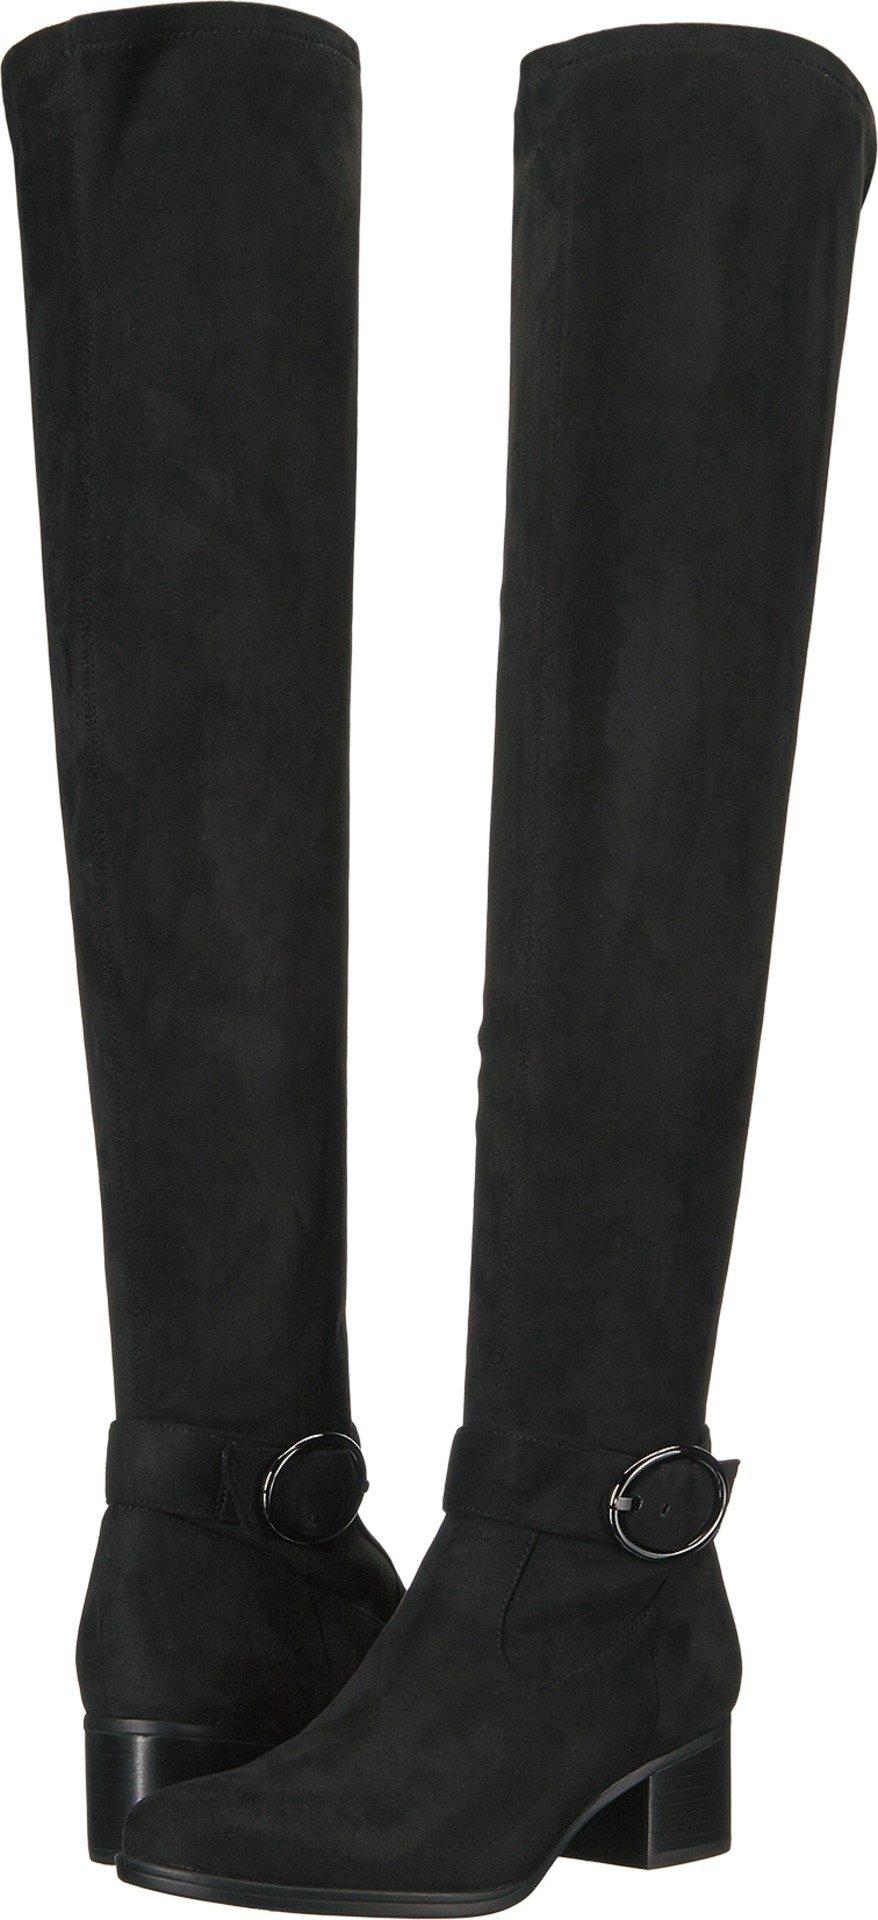 Naturalizer Women's Dayln Slouch Boot, Black, 5.5 M US